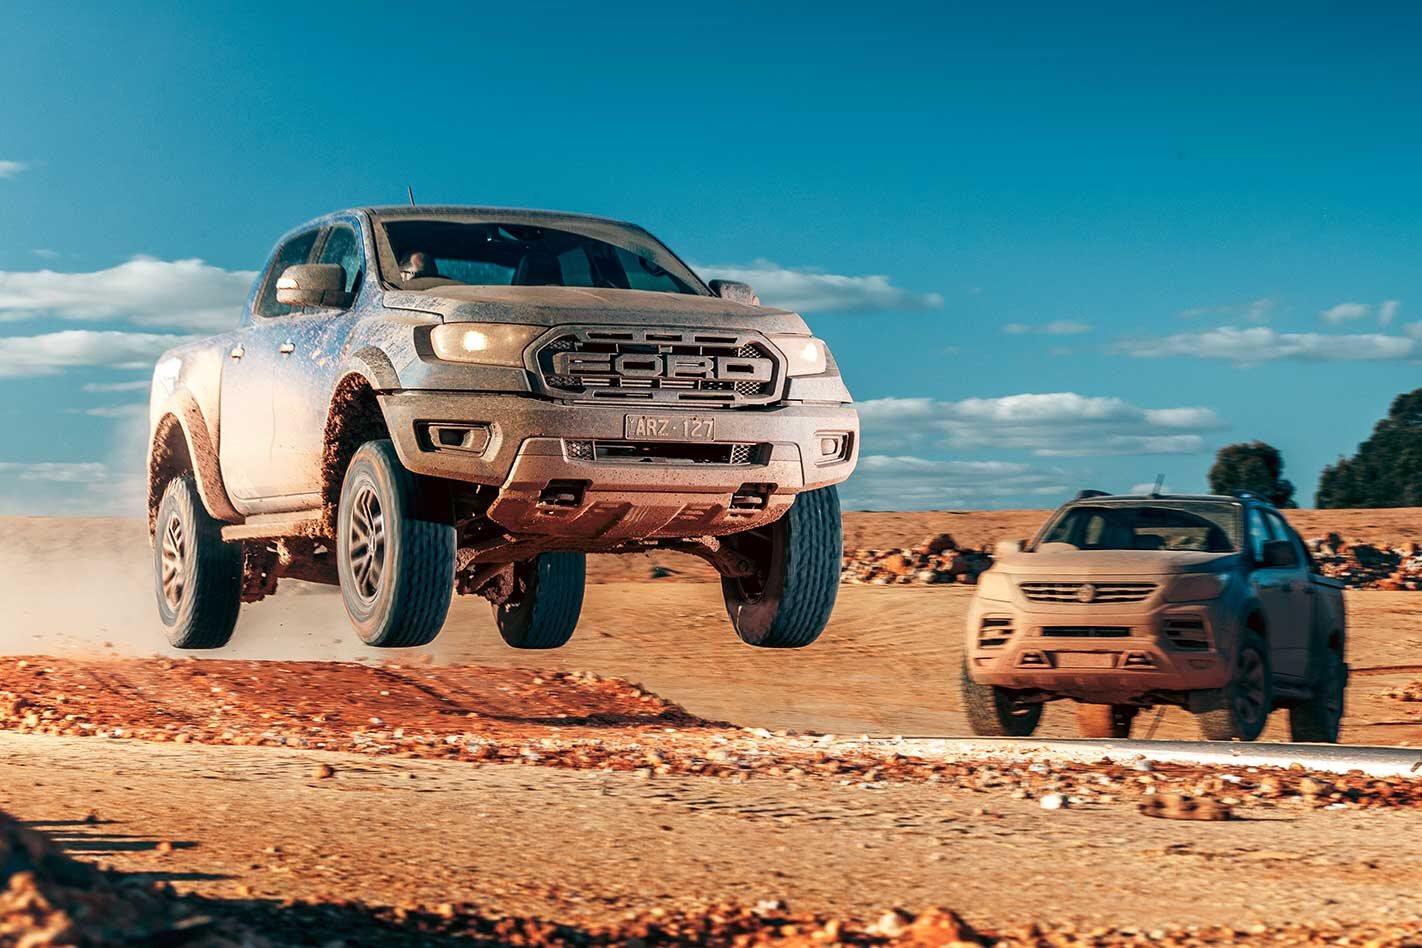 2018 Ford Ranger Raptor vs HSV SportsCat performance comparison review